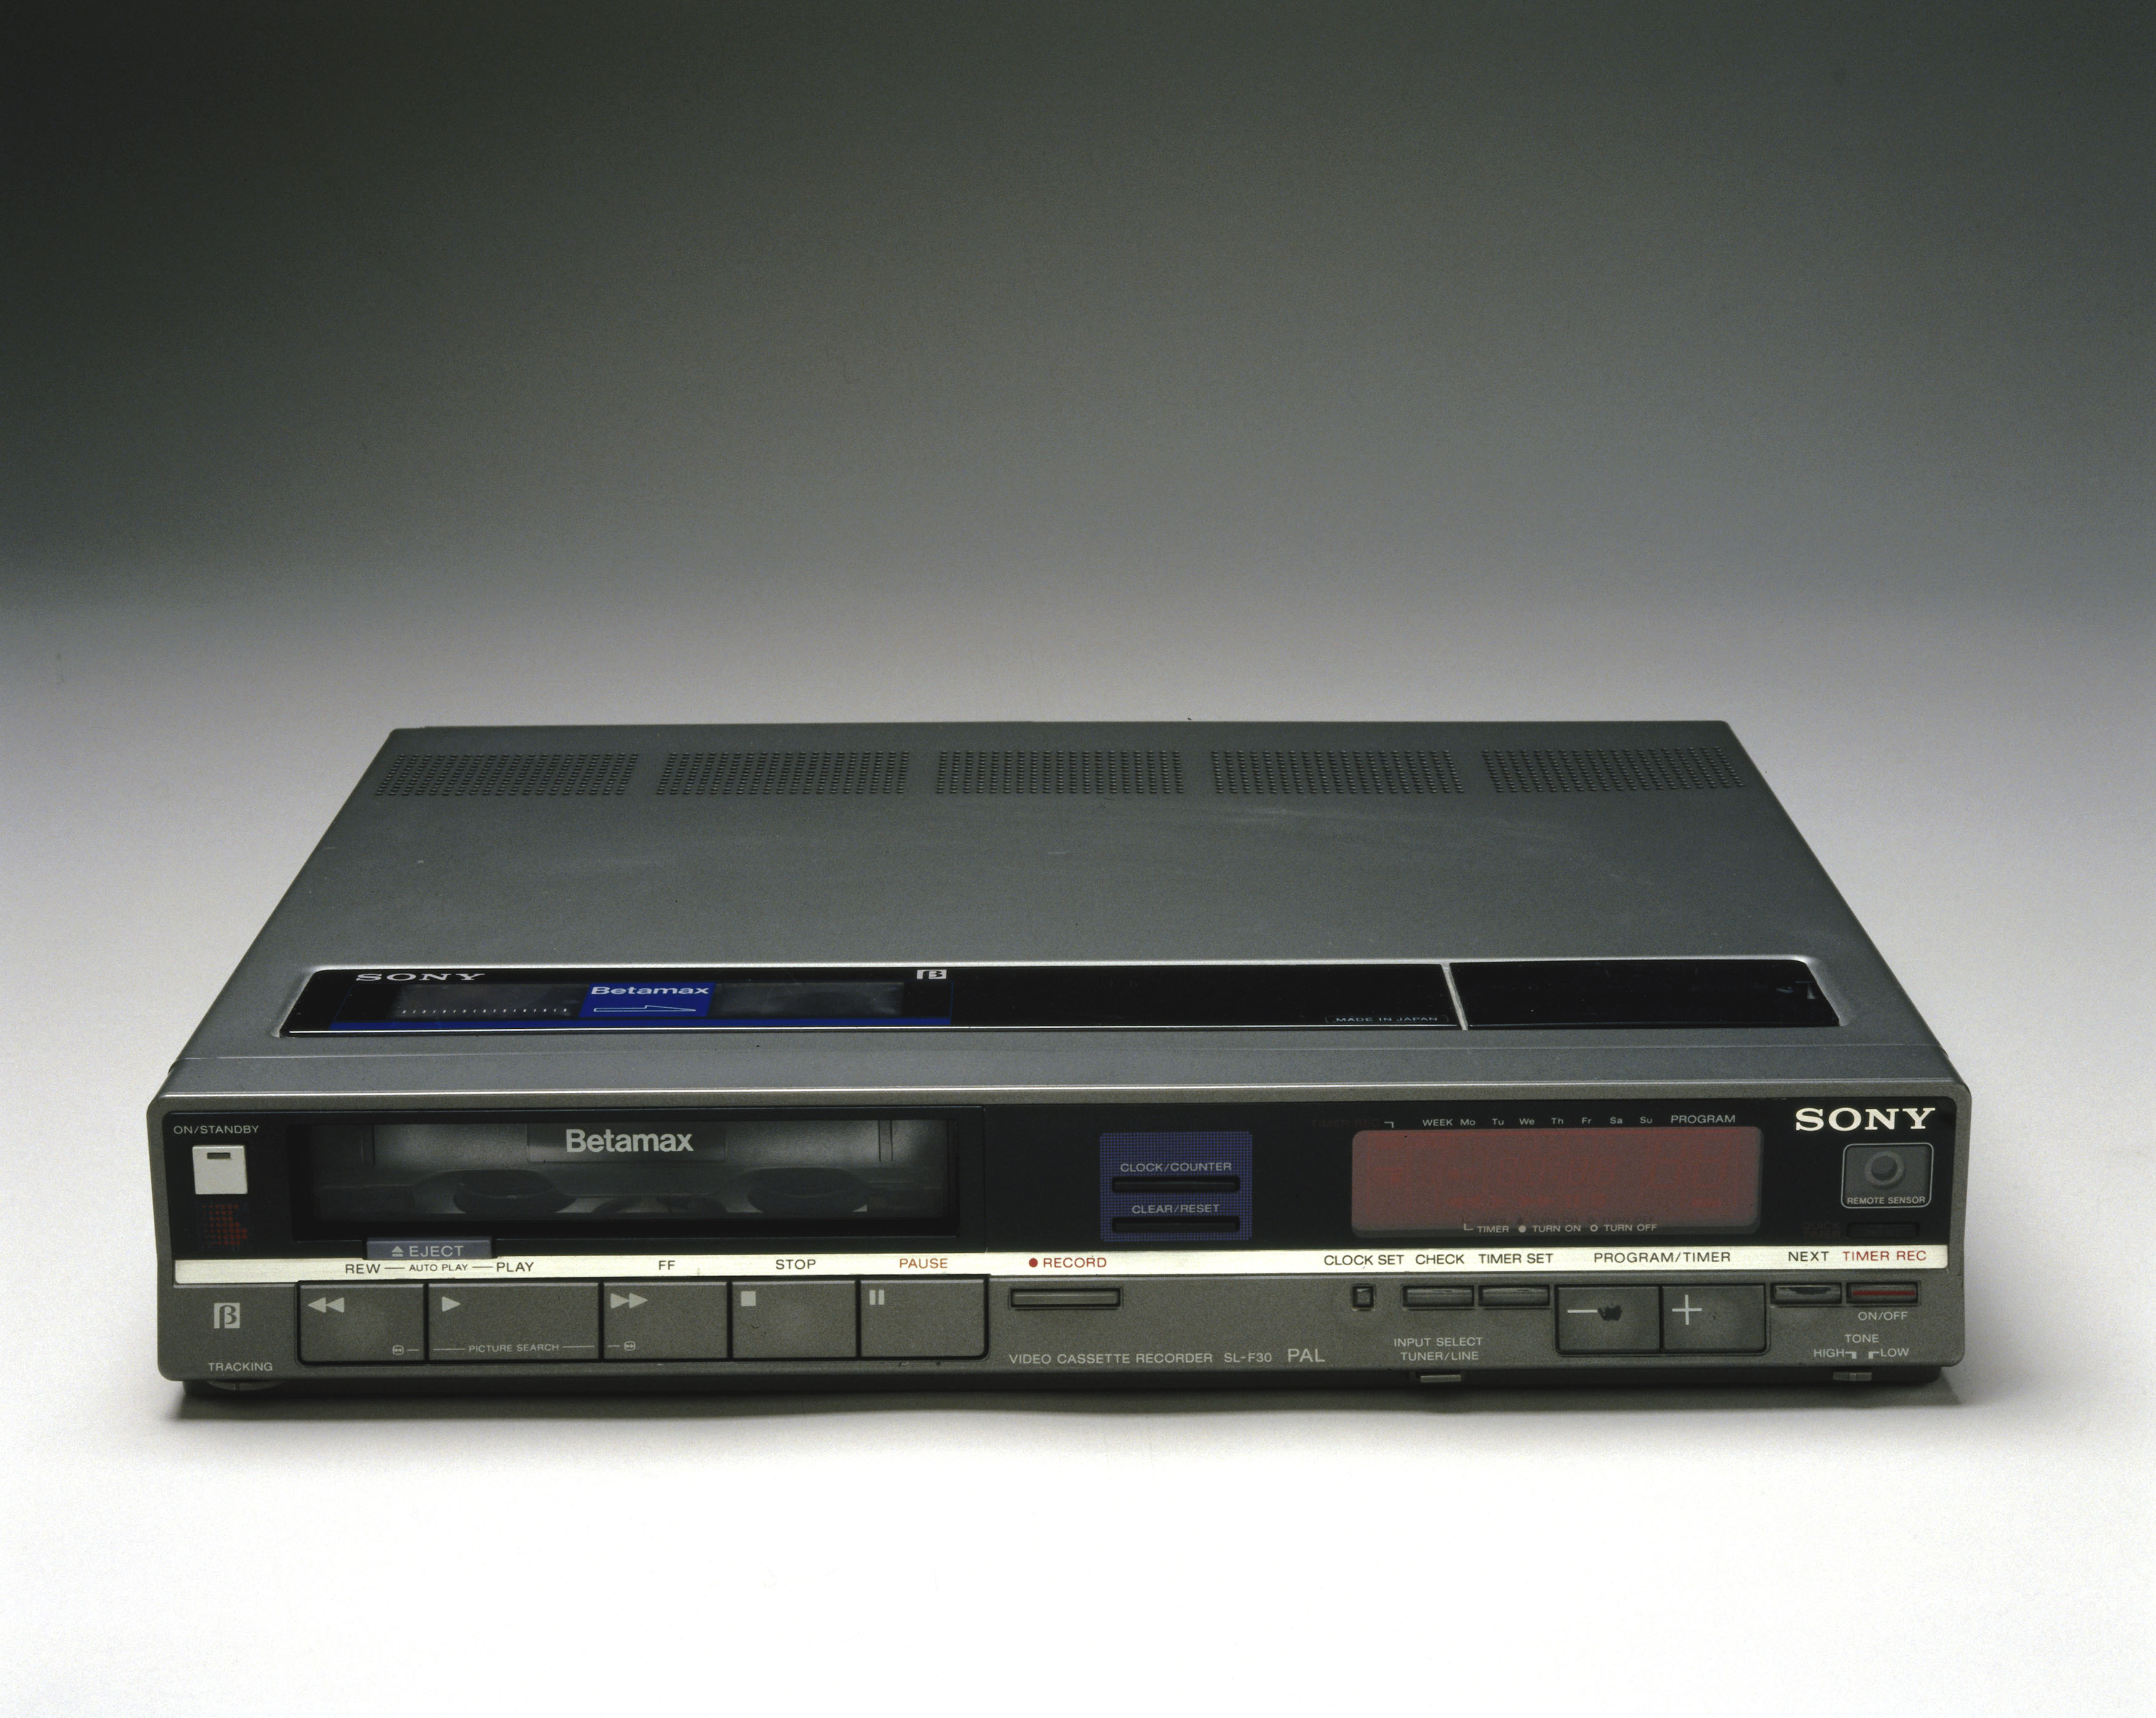 Sony Beta SL-F30UB video cassette recorder, 1985.